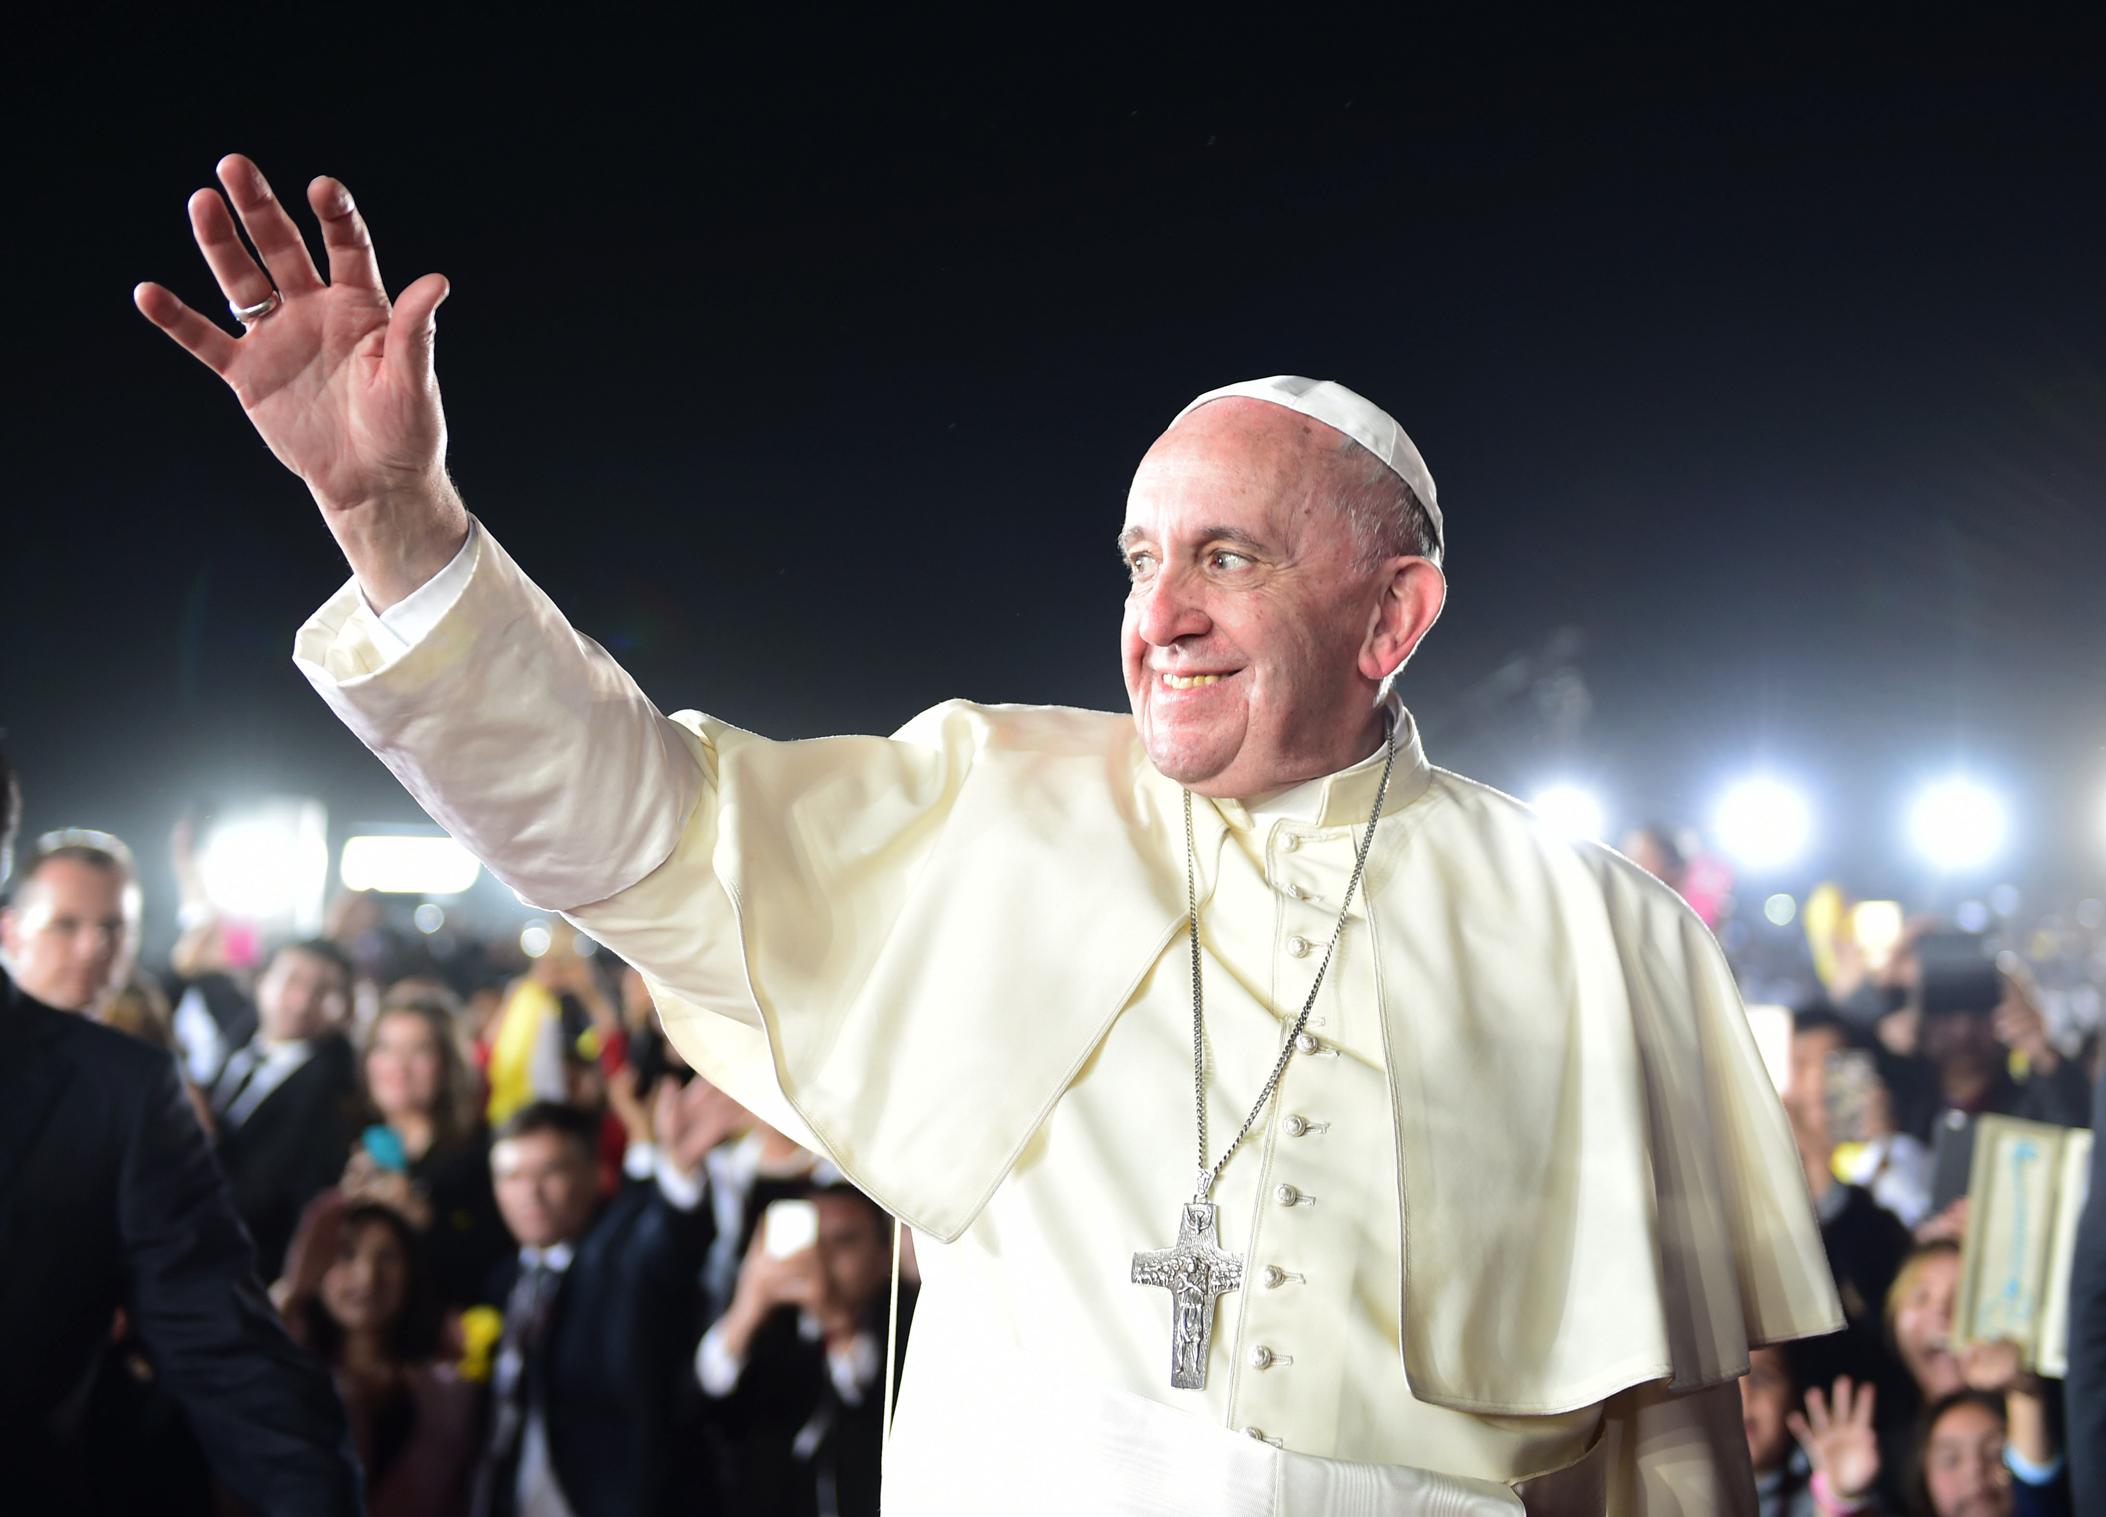 FileDespedida A SS Papa Francisco